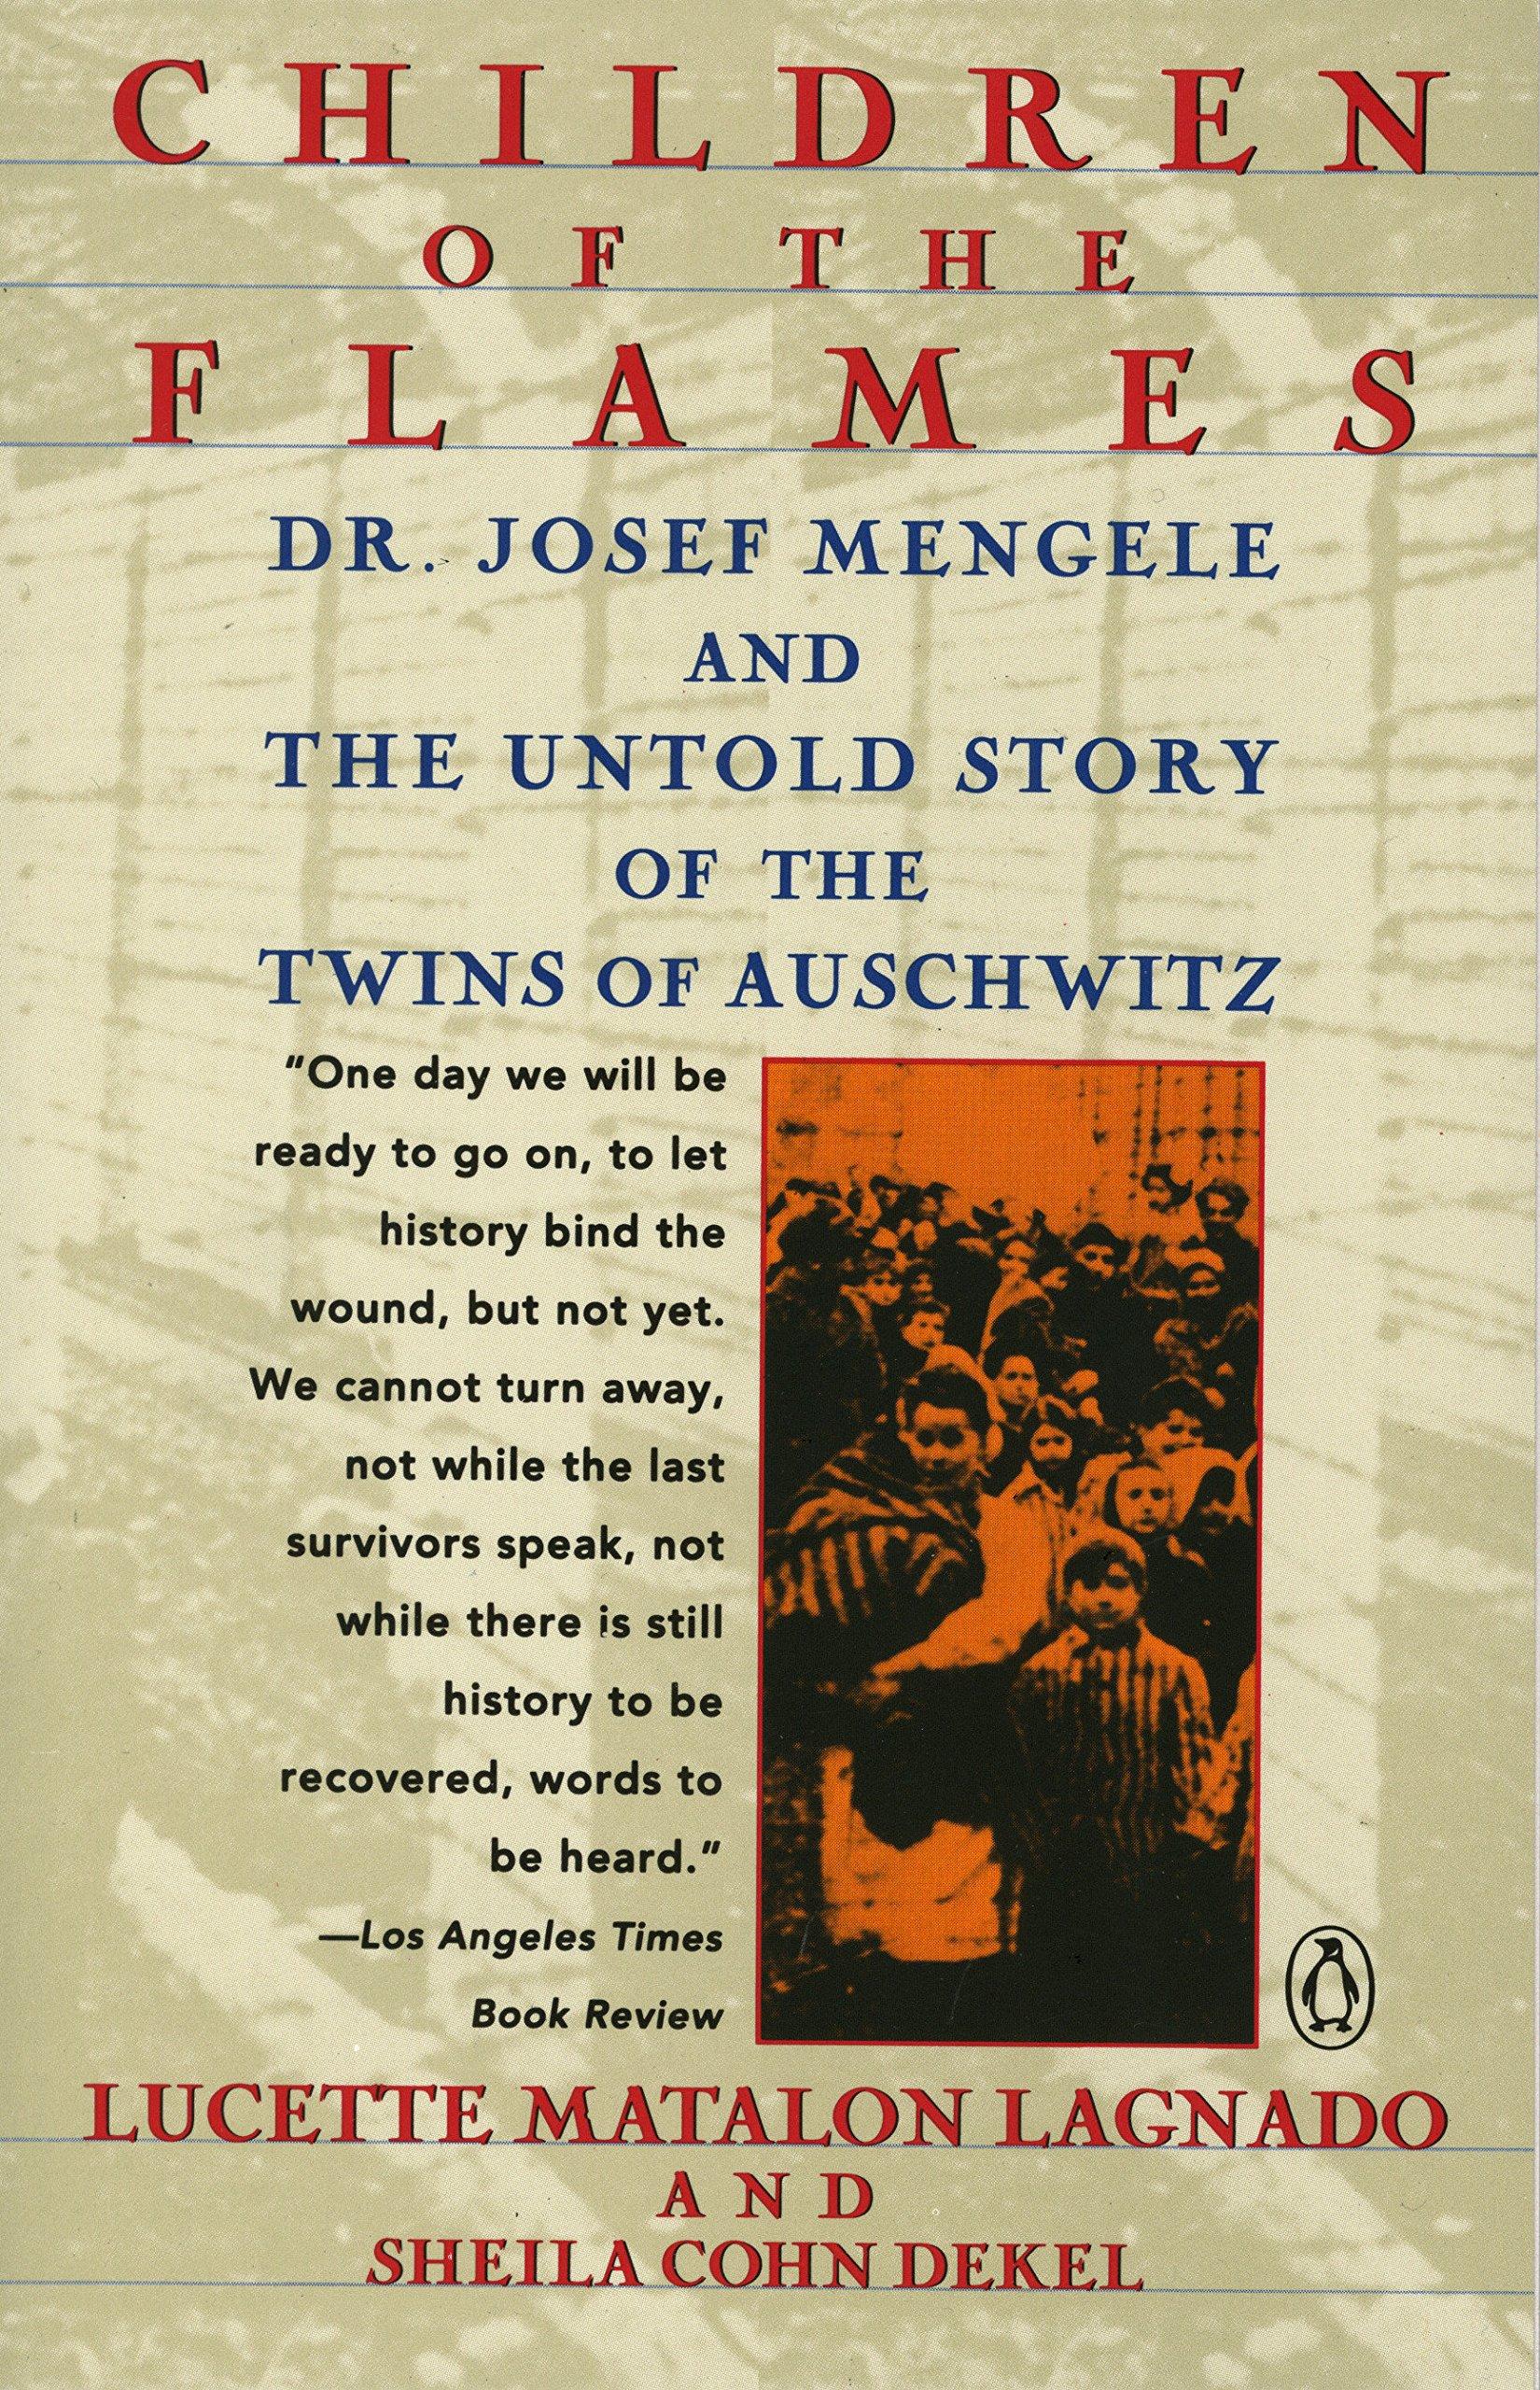 Children of the Flames: Dr. Josef Mengele and the Untold Story of the Twins  of Auschwitz: Lucette Matalon Lagnado, Sheila Cohn Dekel: 8601405824141: ...